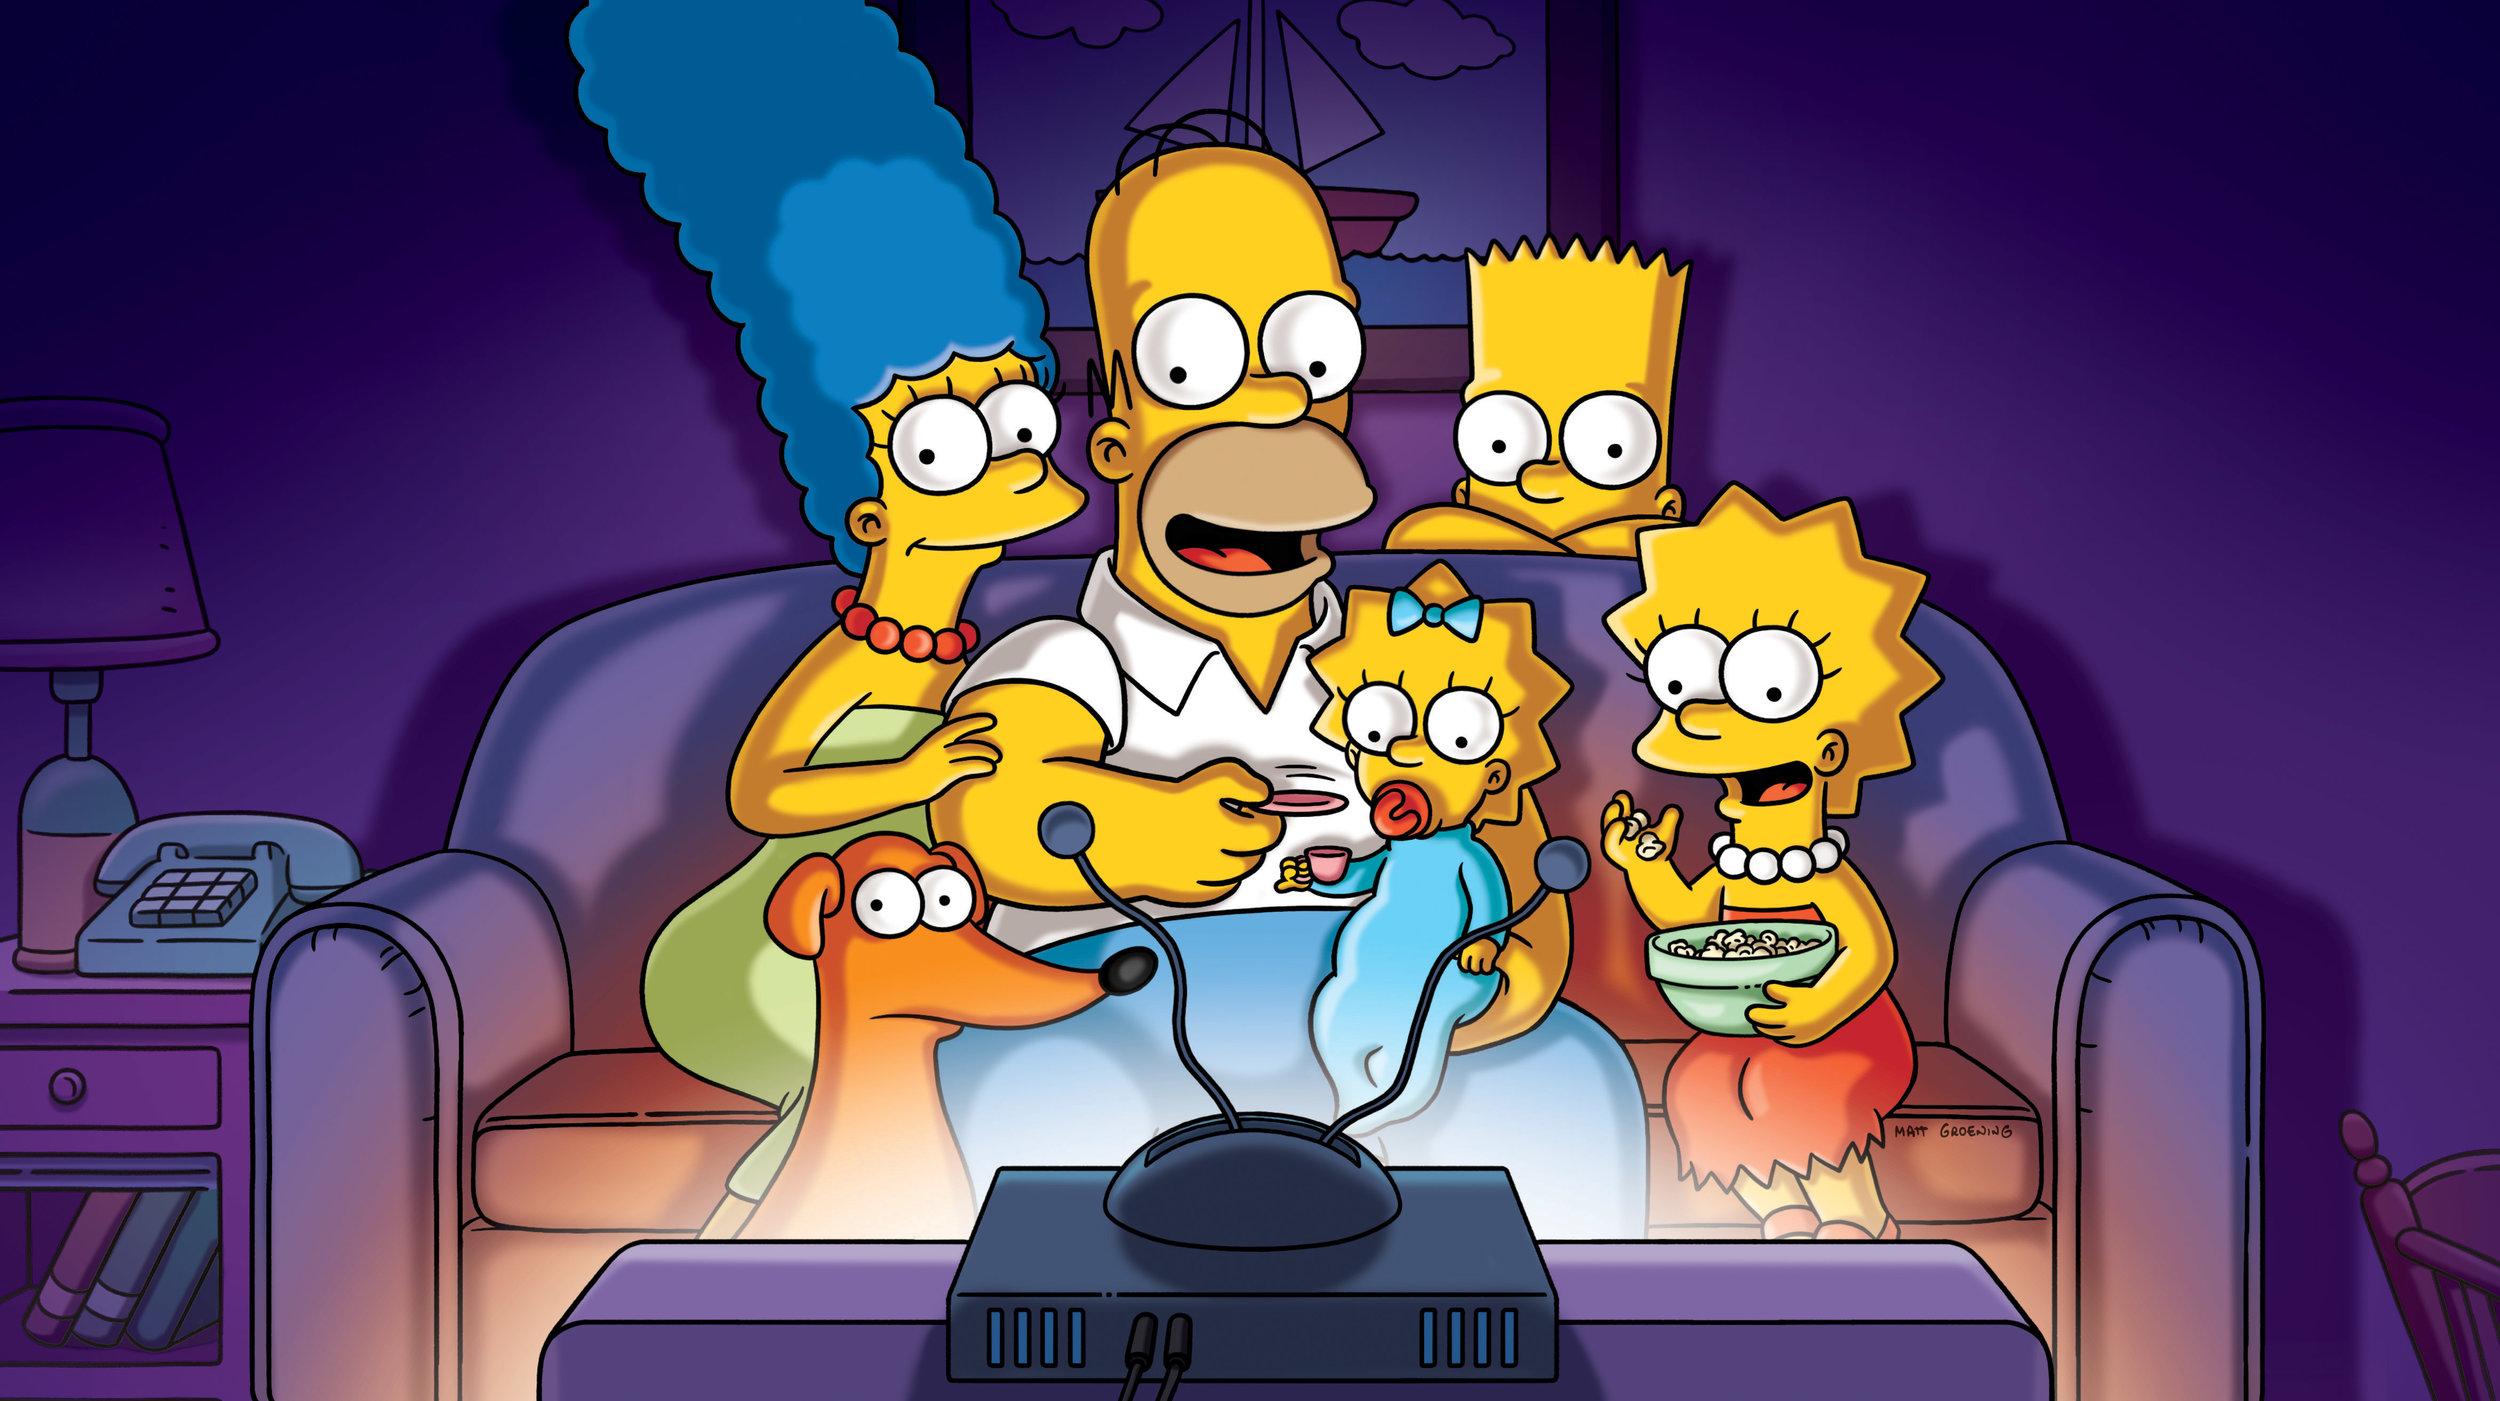 SimpsonsBG_2013_R1d.jpg